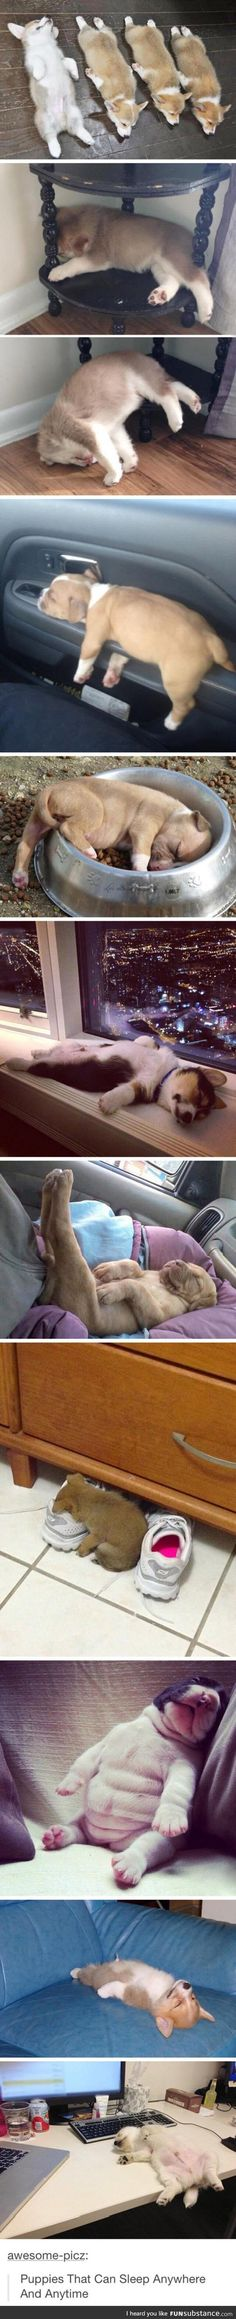 Puppies can sleep anywhere